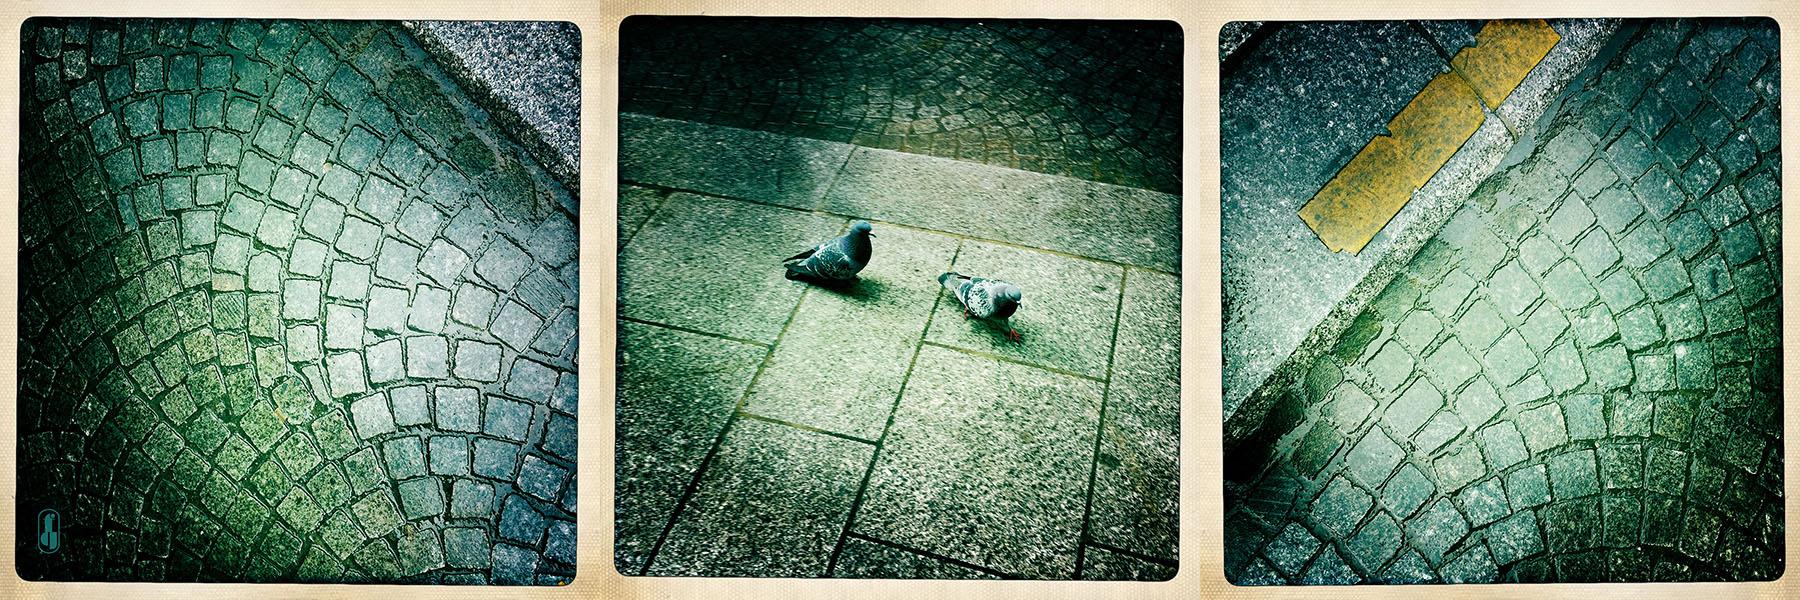 Rue francaise under rain.jpg